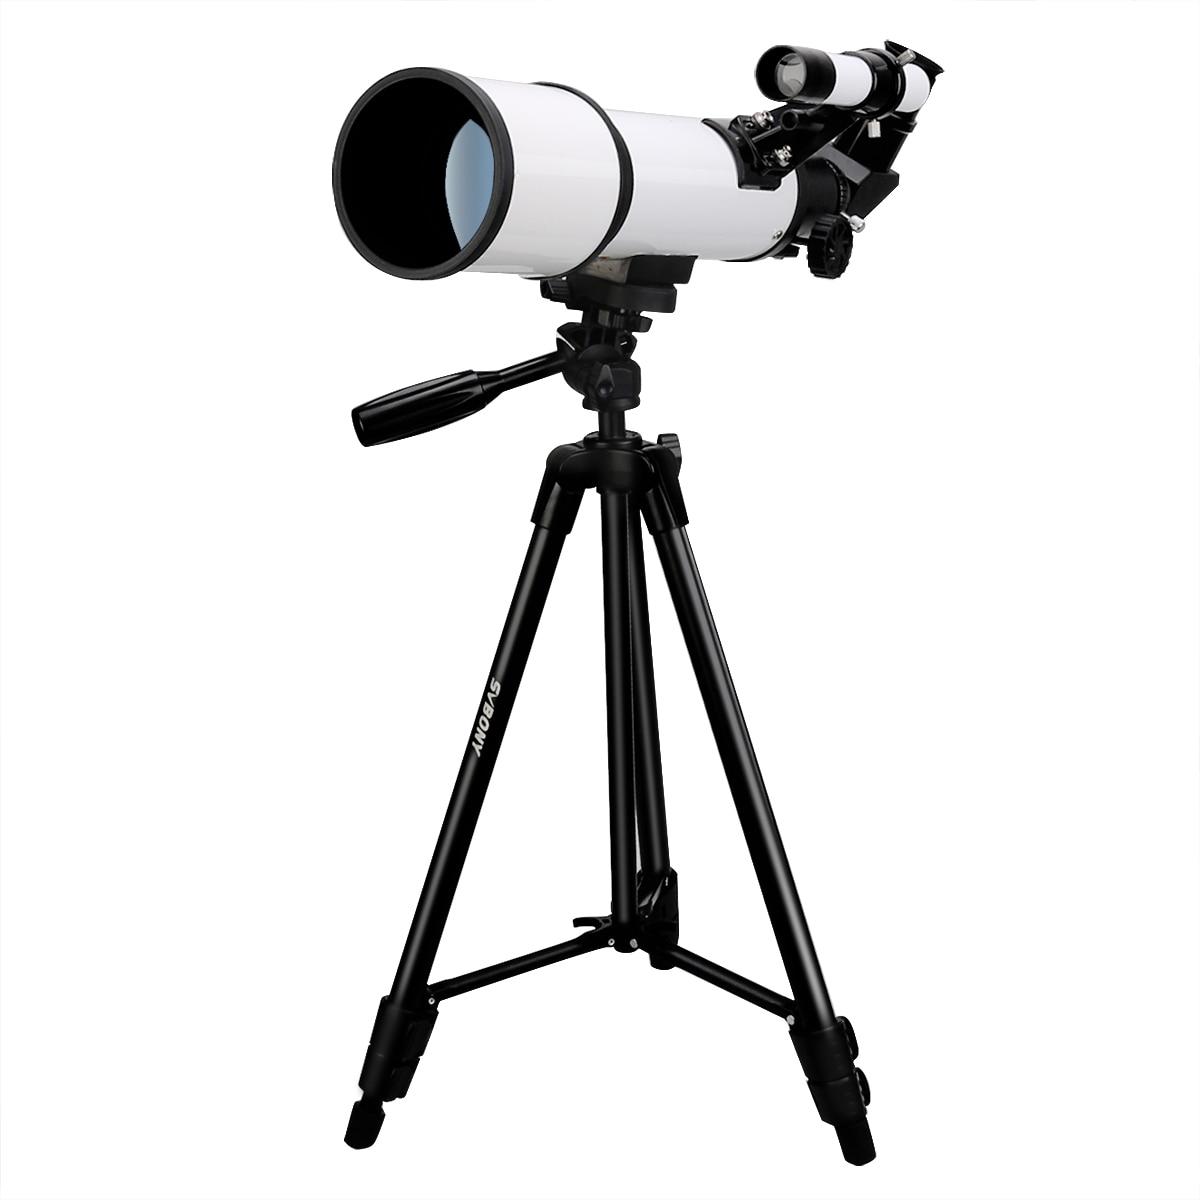 Svbony sv501 70420 f6 hd telescópio astronômico